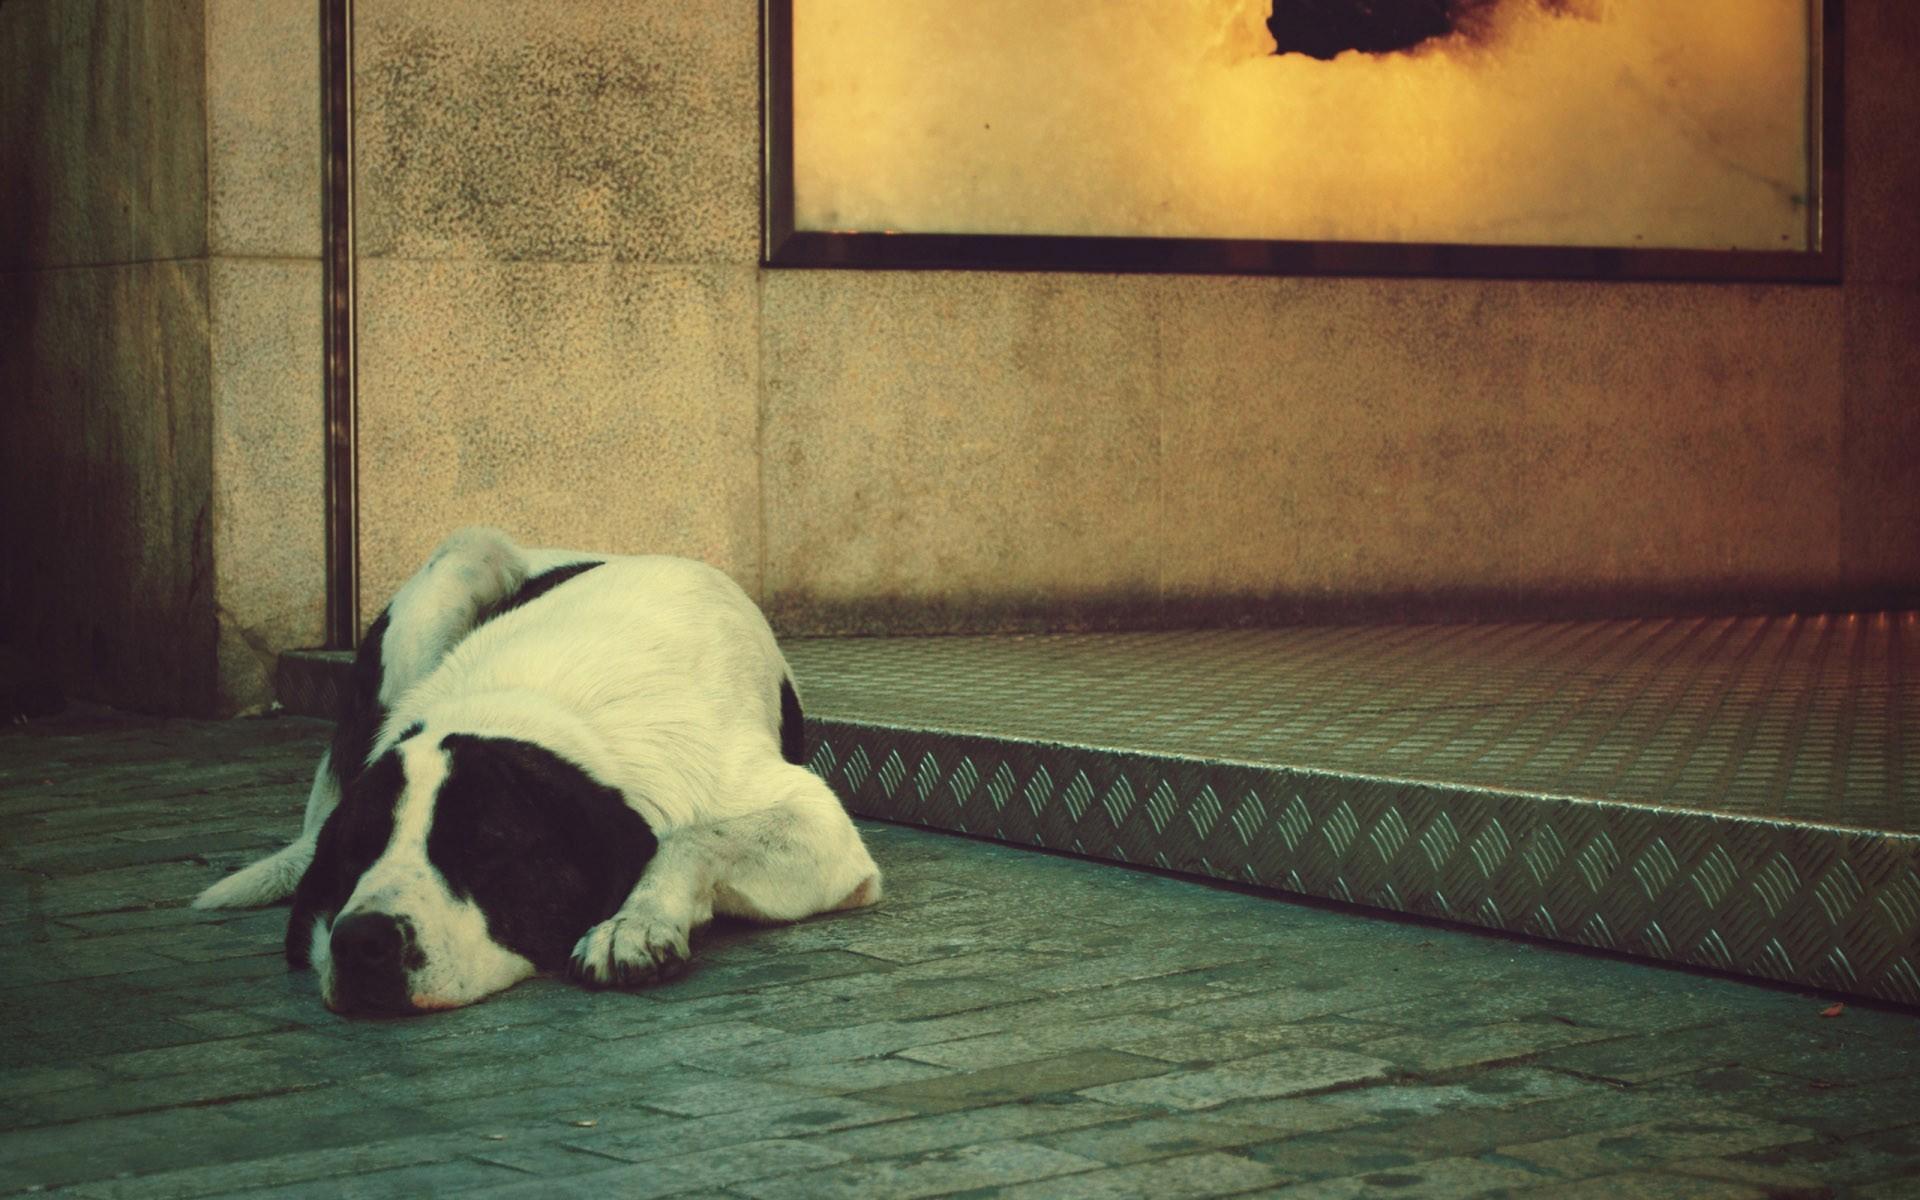 Sleeping dog wallpaper 10007 1920x1200